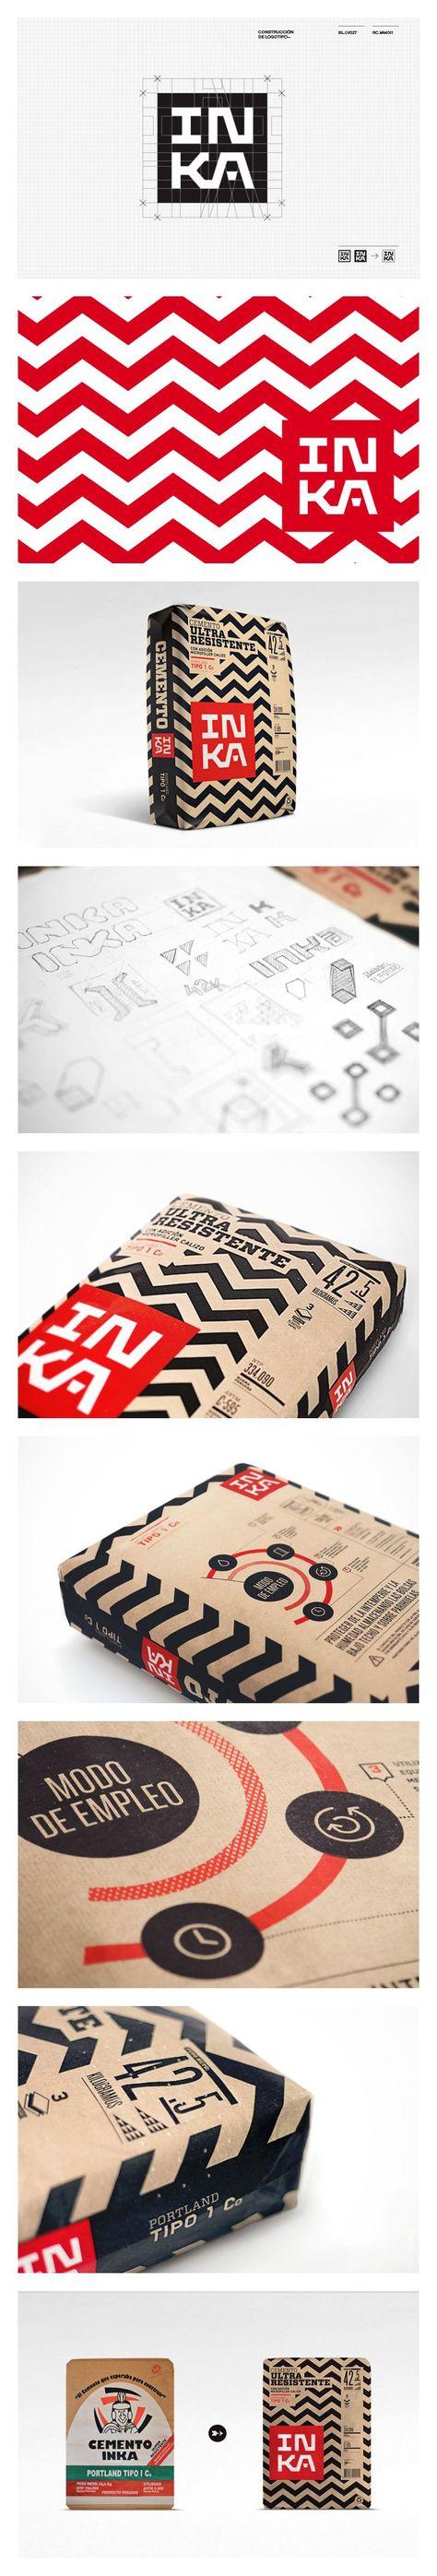 Downgraf - Inspiration for Designers & Graphic Design Inspiration Source